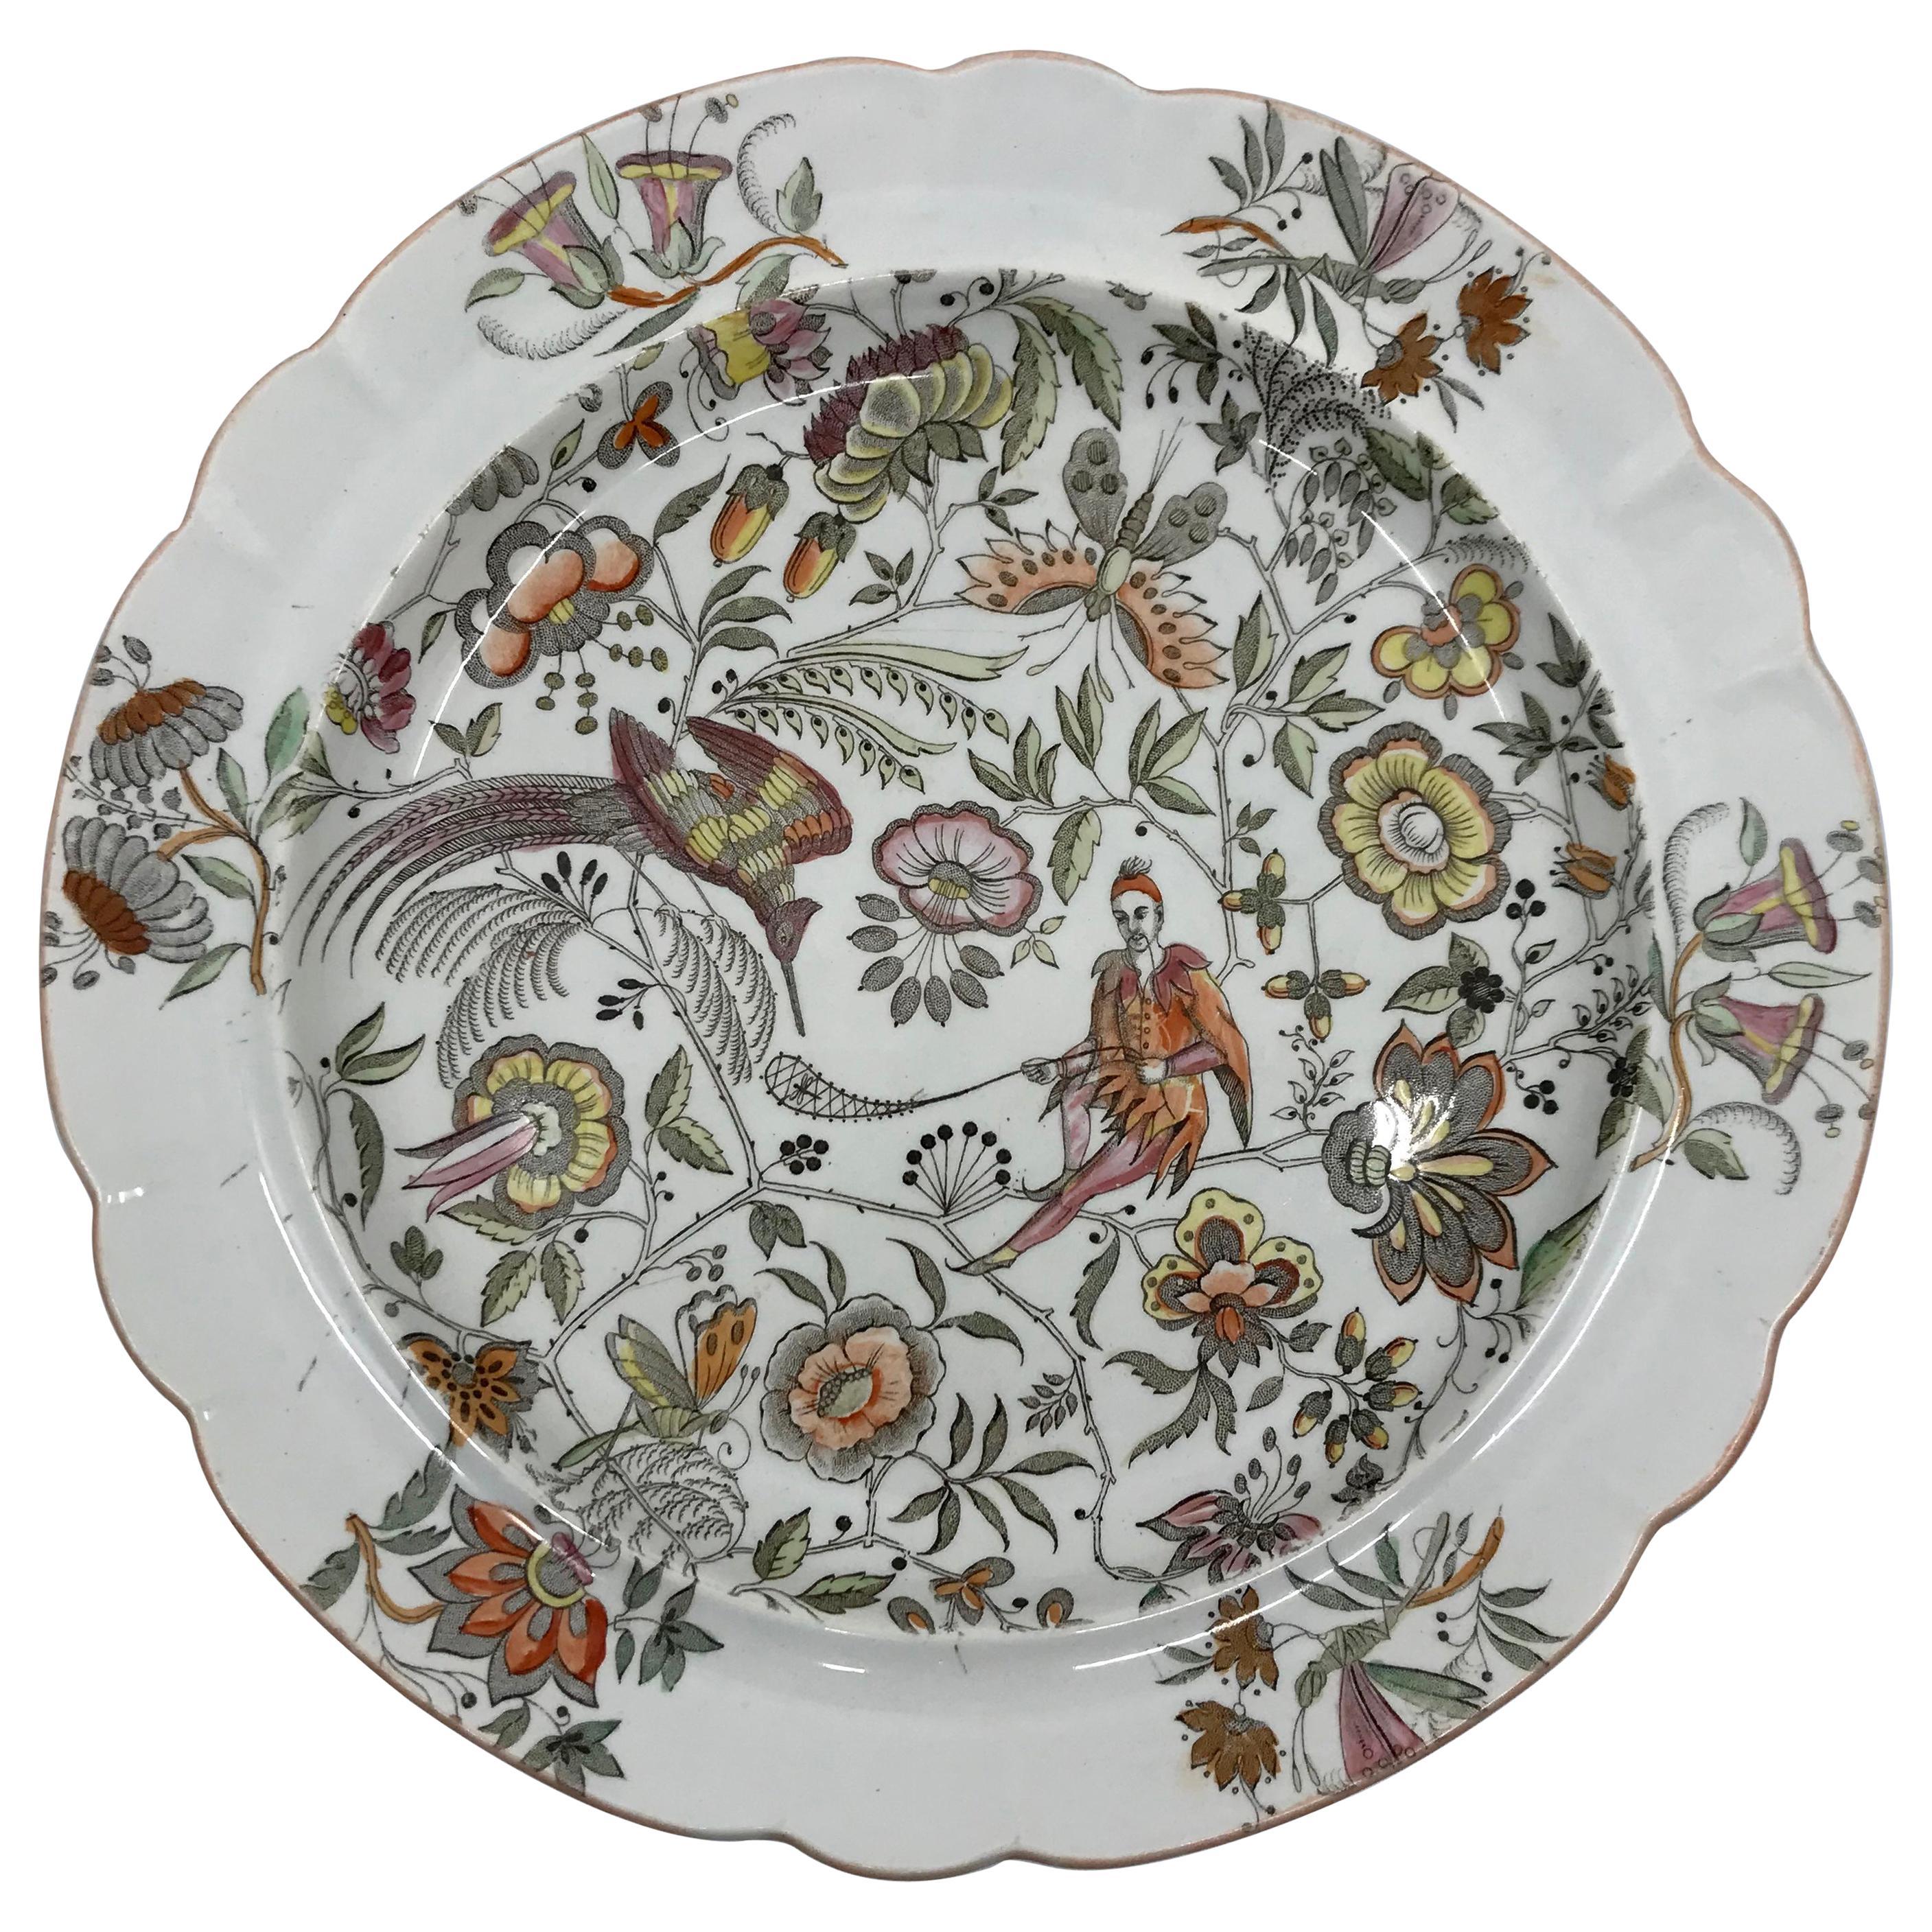 Wedgwood Chinoiserie Plate